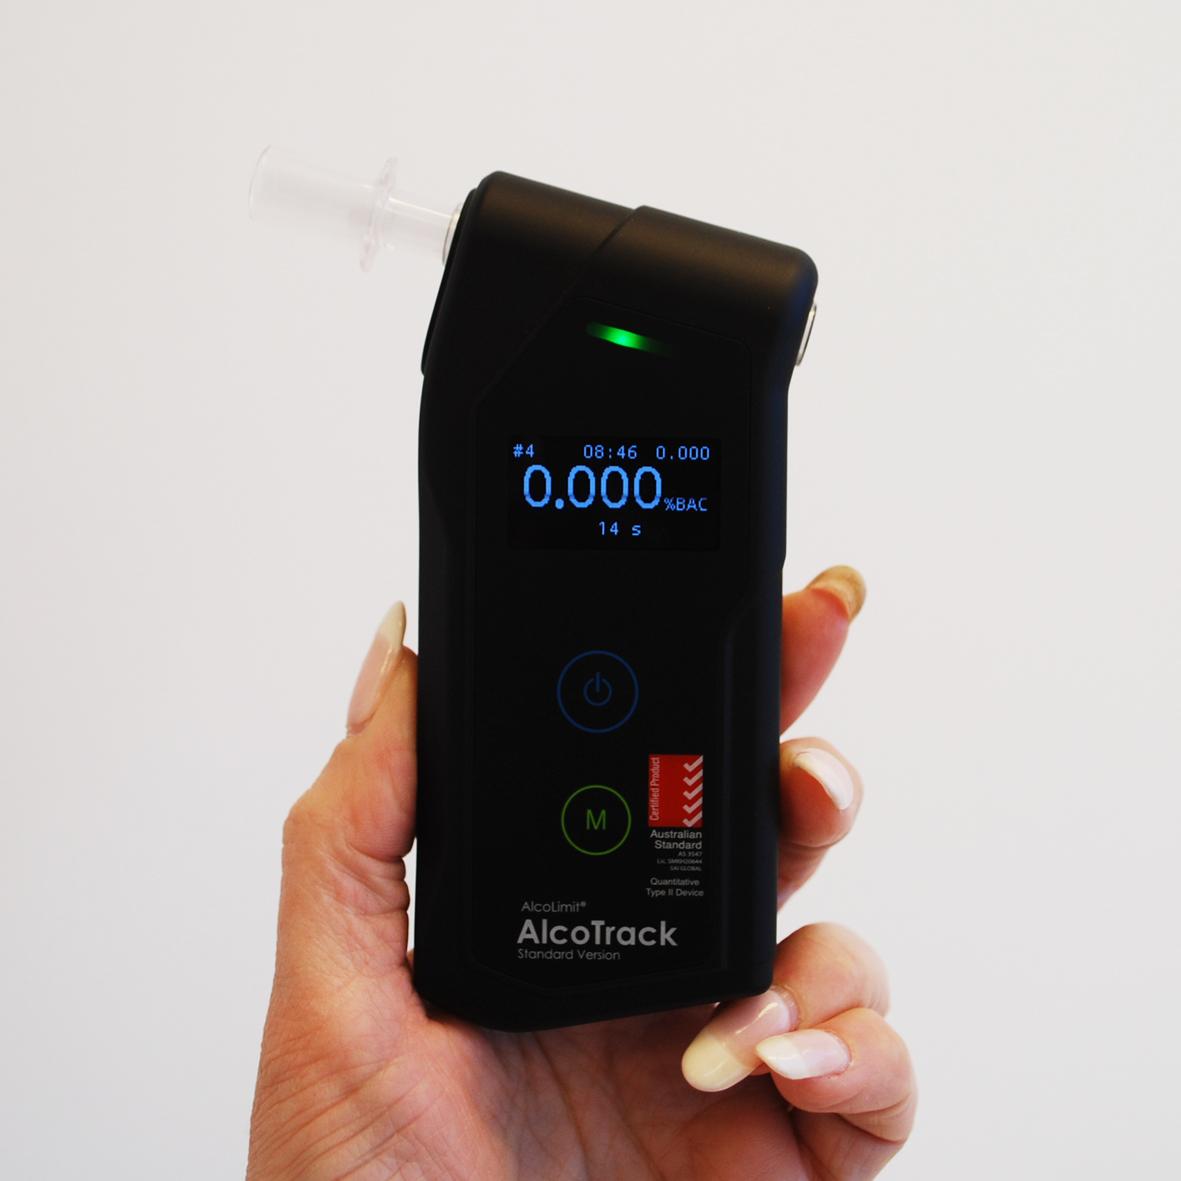 AlcoTrack 000 Display